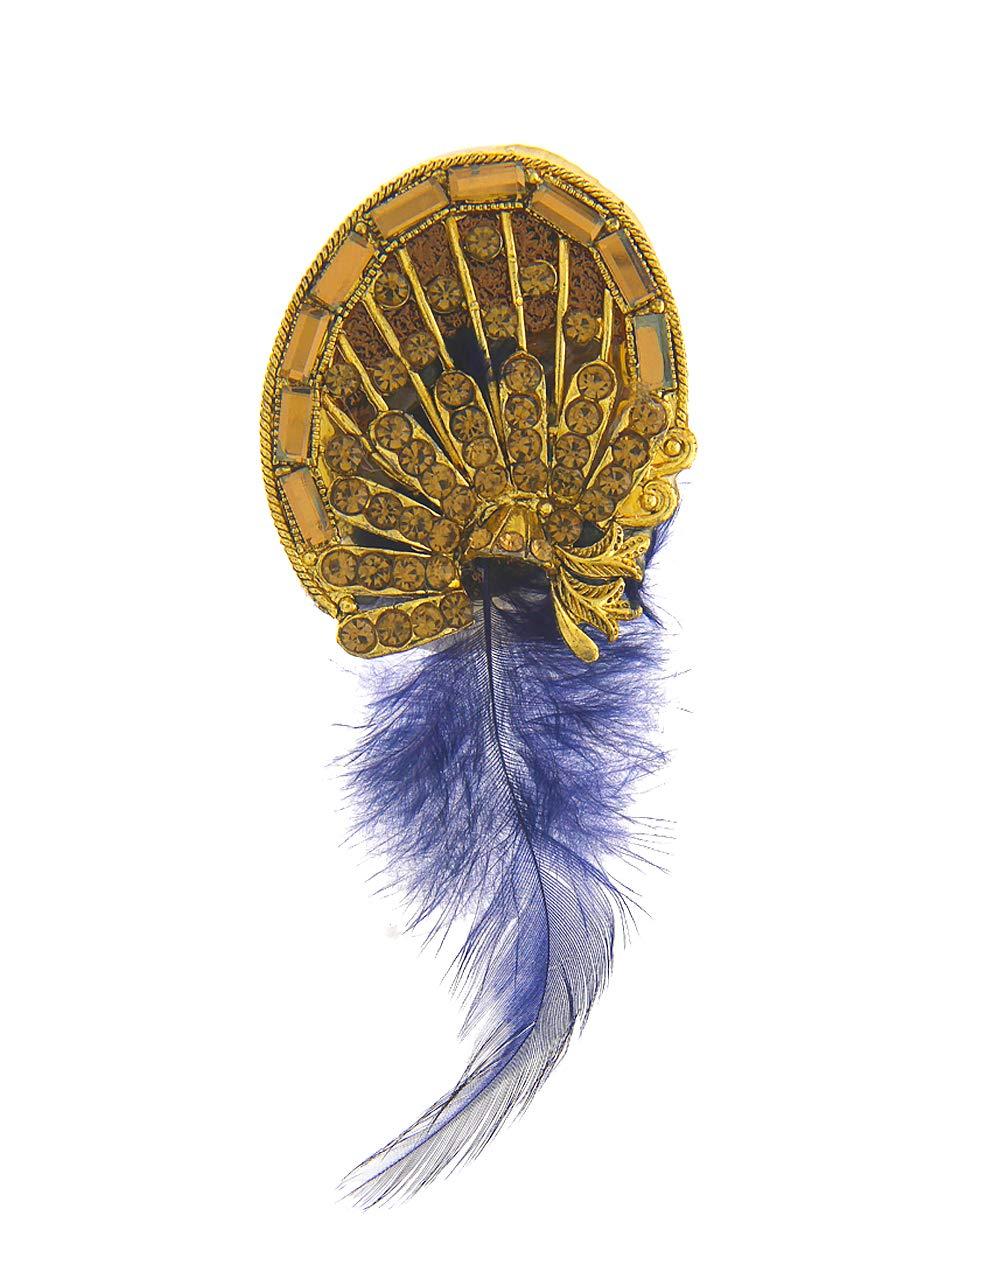 Anuradha Art Blue Colour Wonderful Classy Styled with Feather Wonderful Sari/Saree Pin for Women/Girls